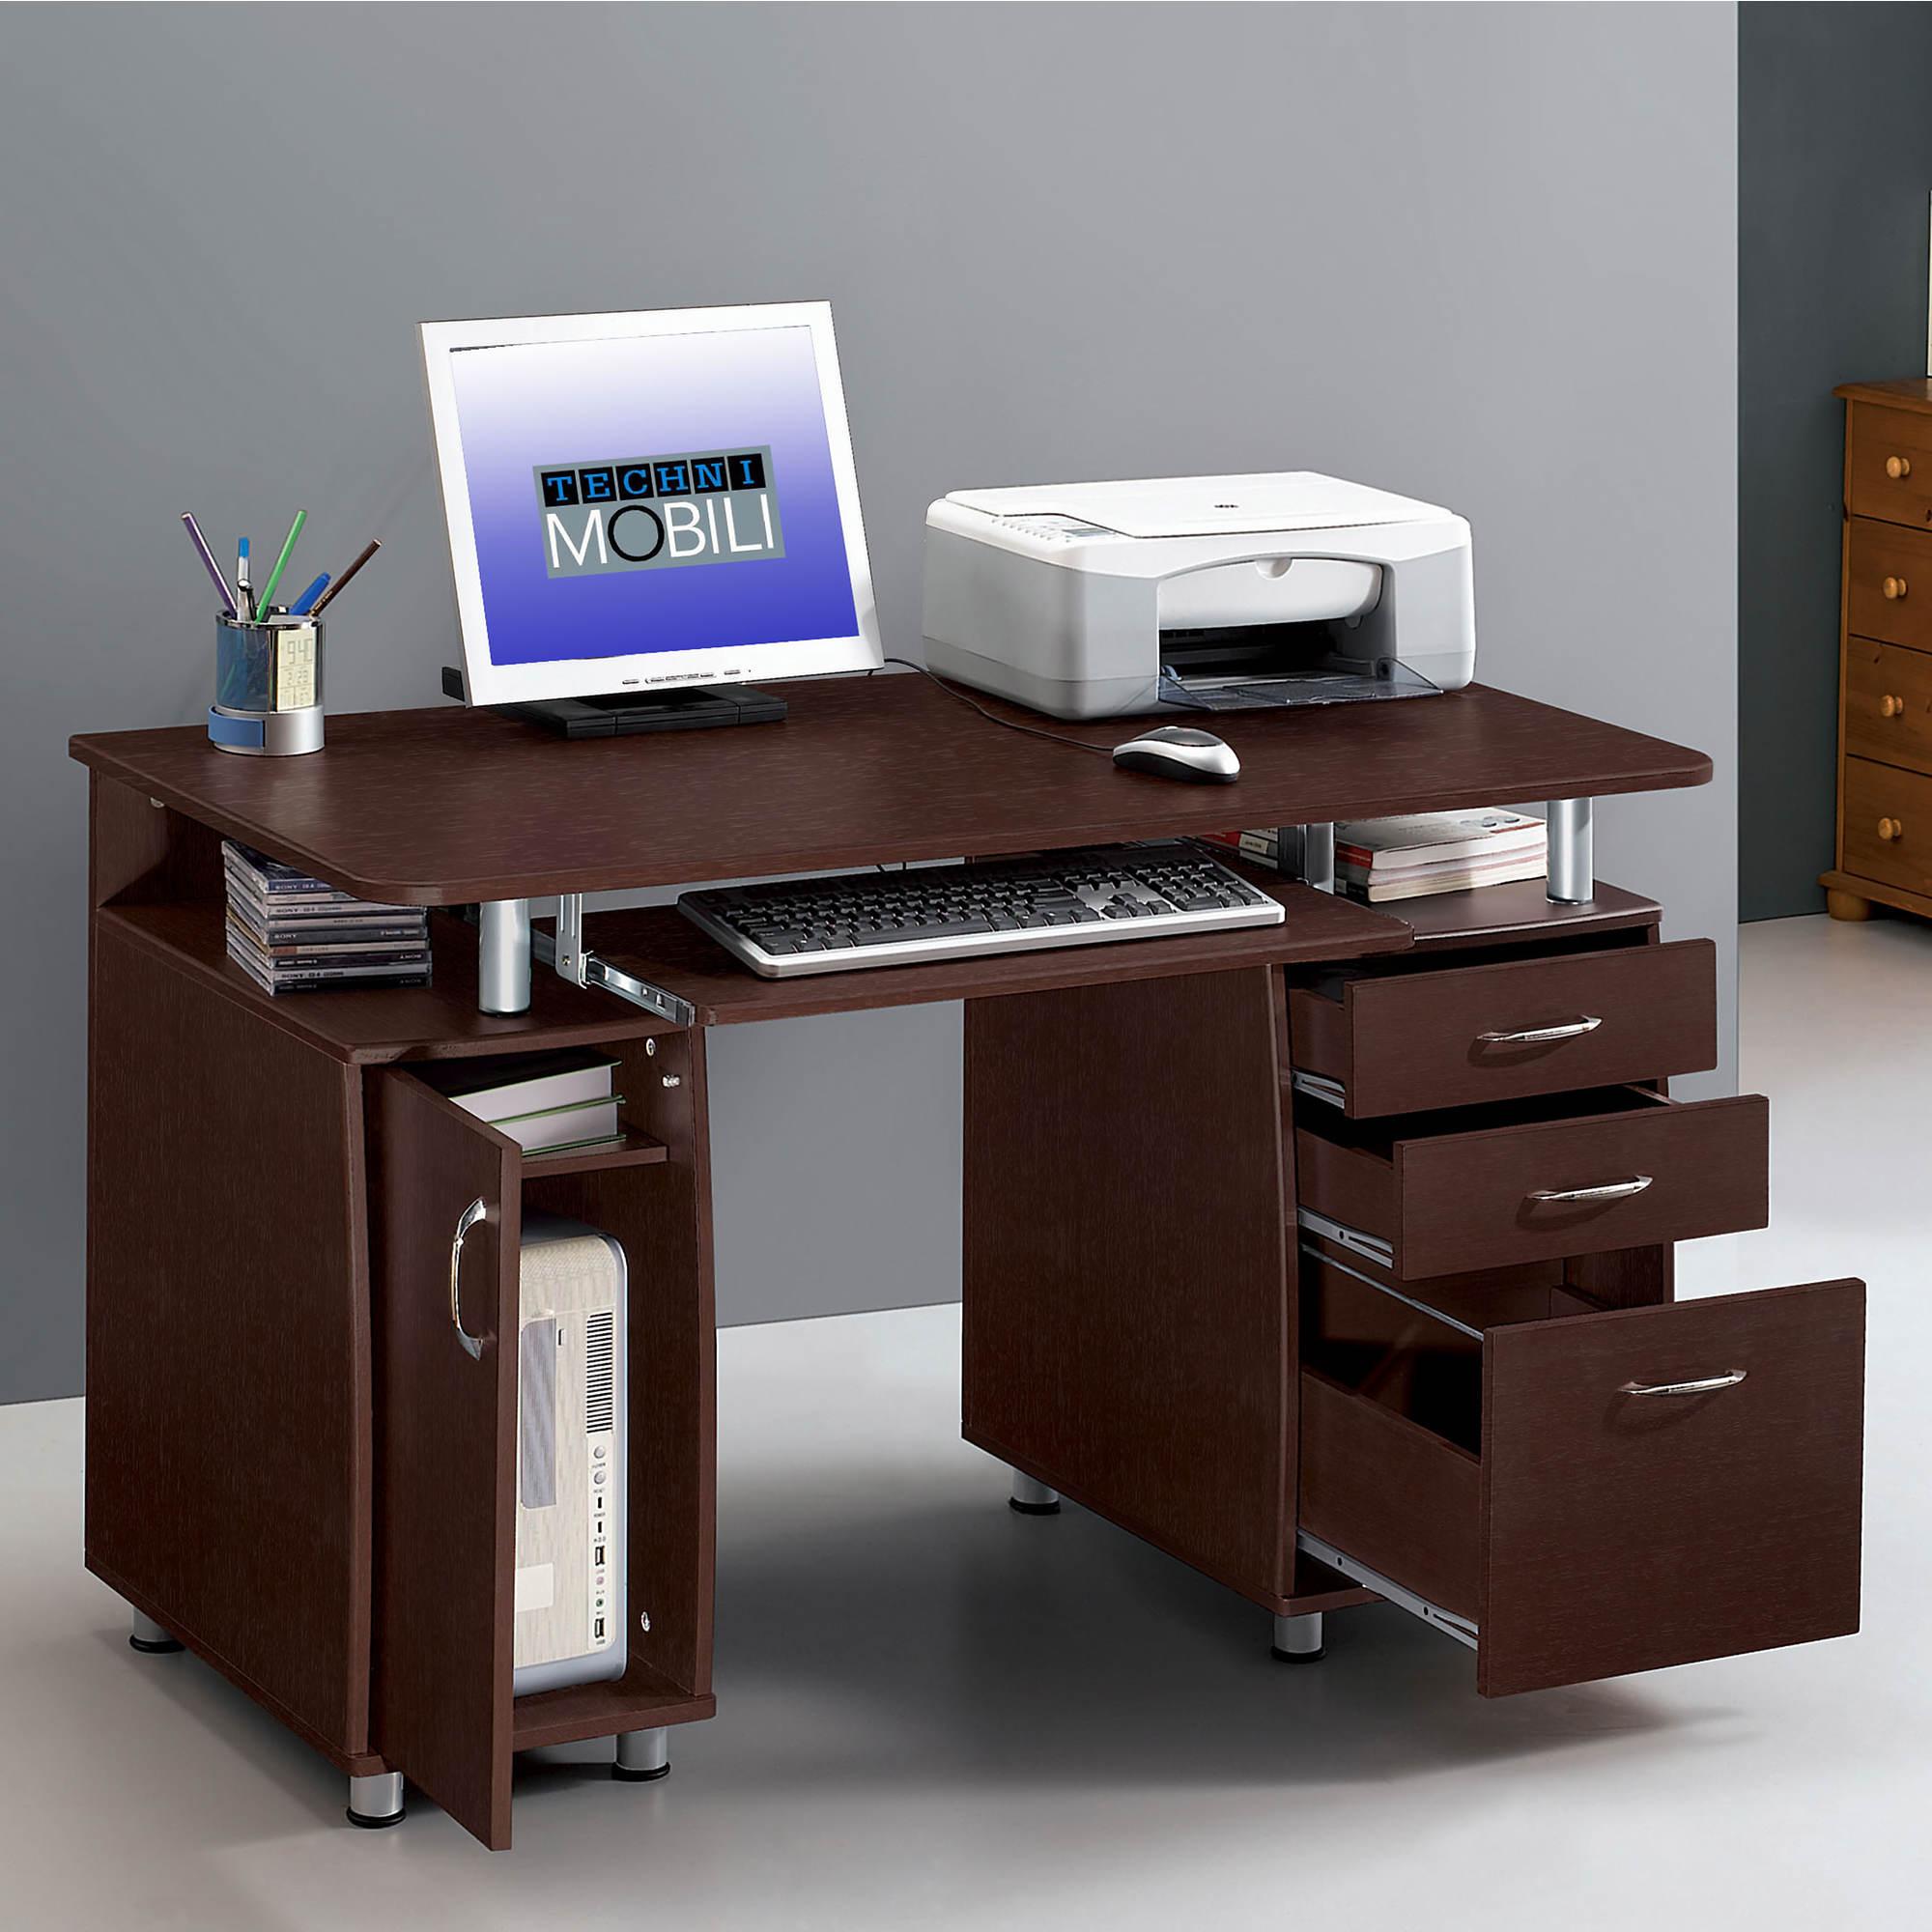 Techni mobili complete computer desk chocolate bj 39 s for Mobili computer